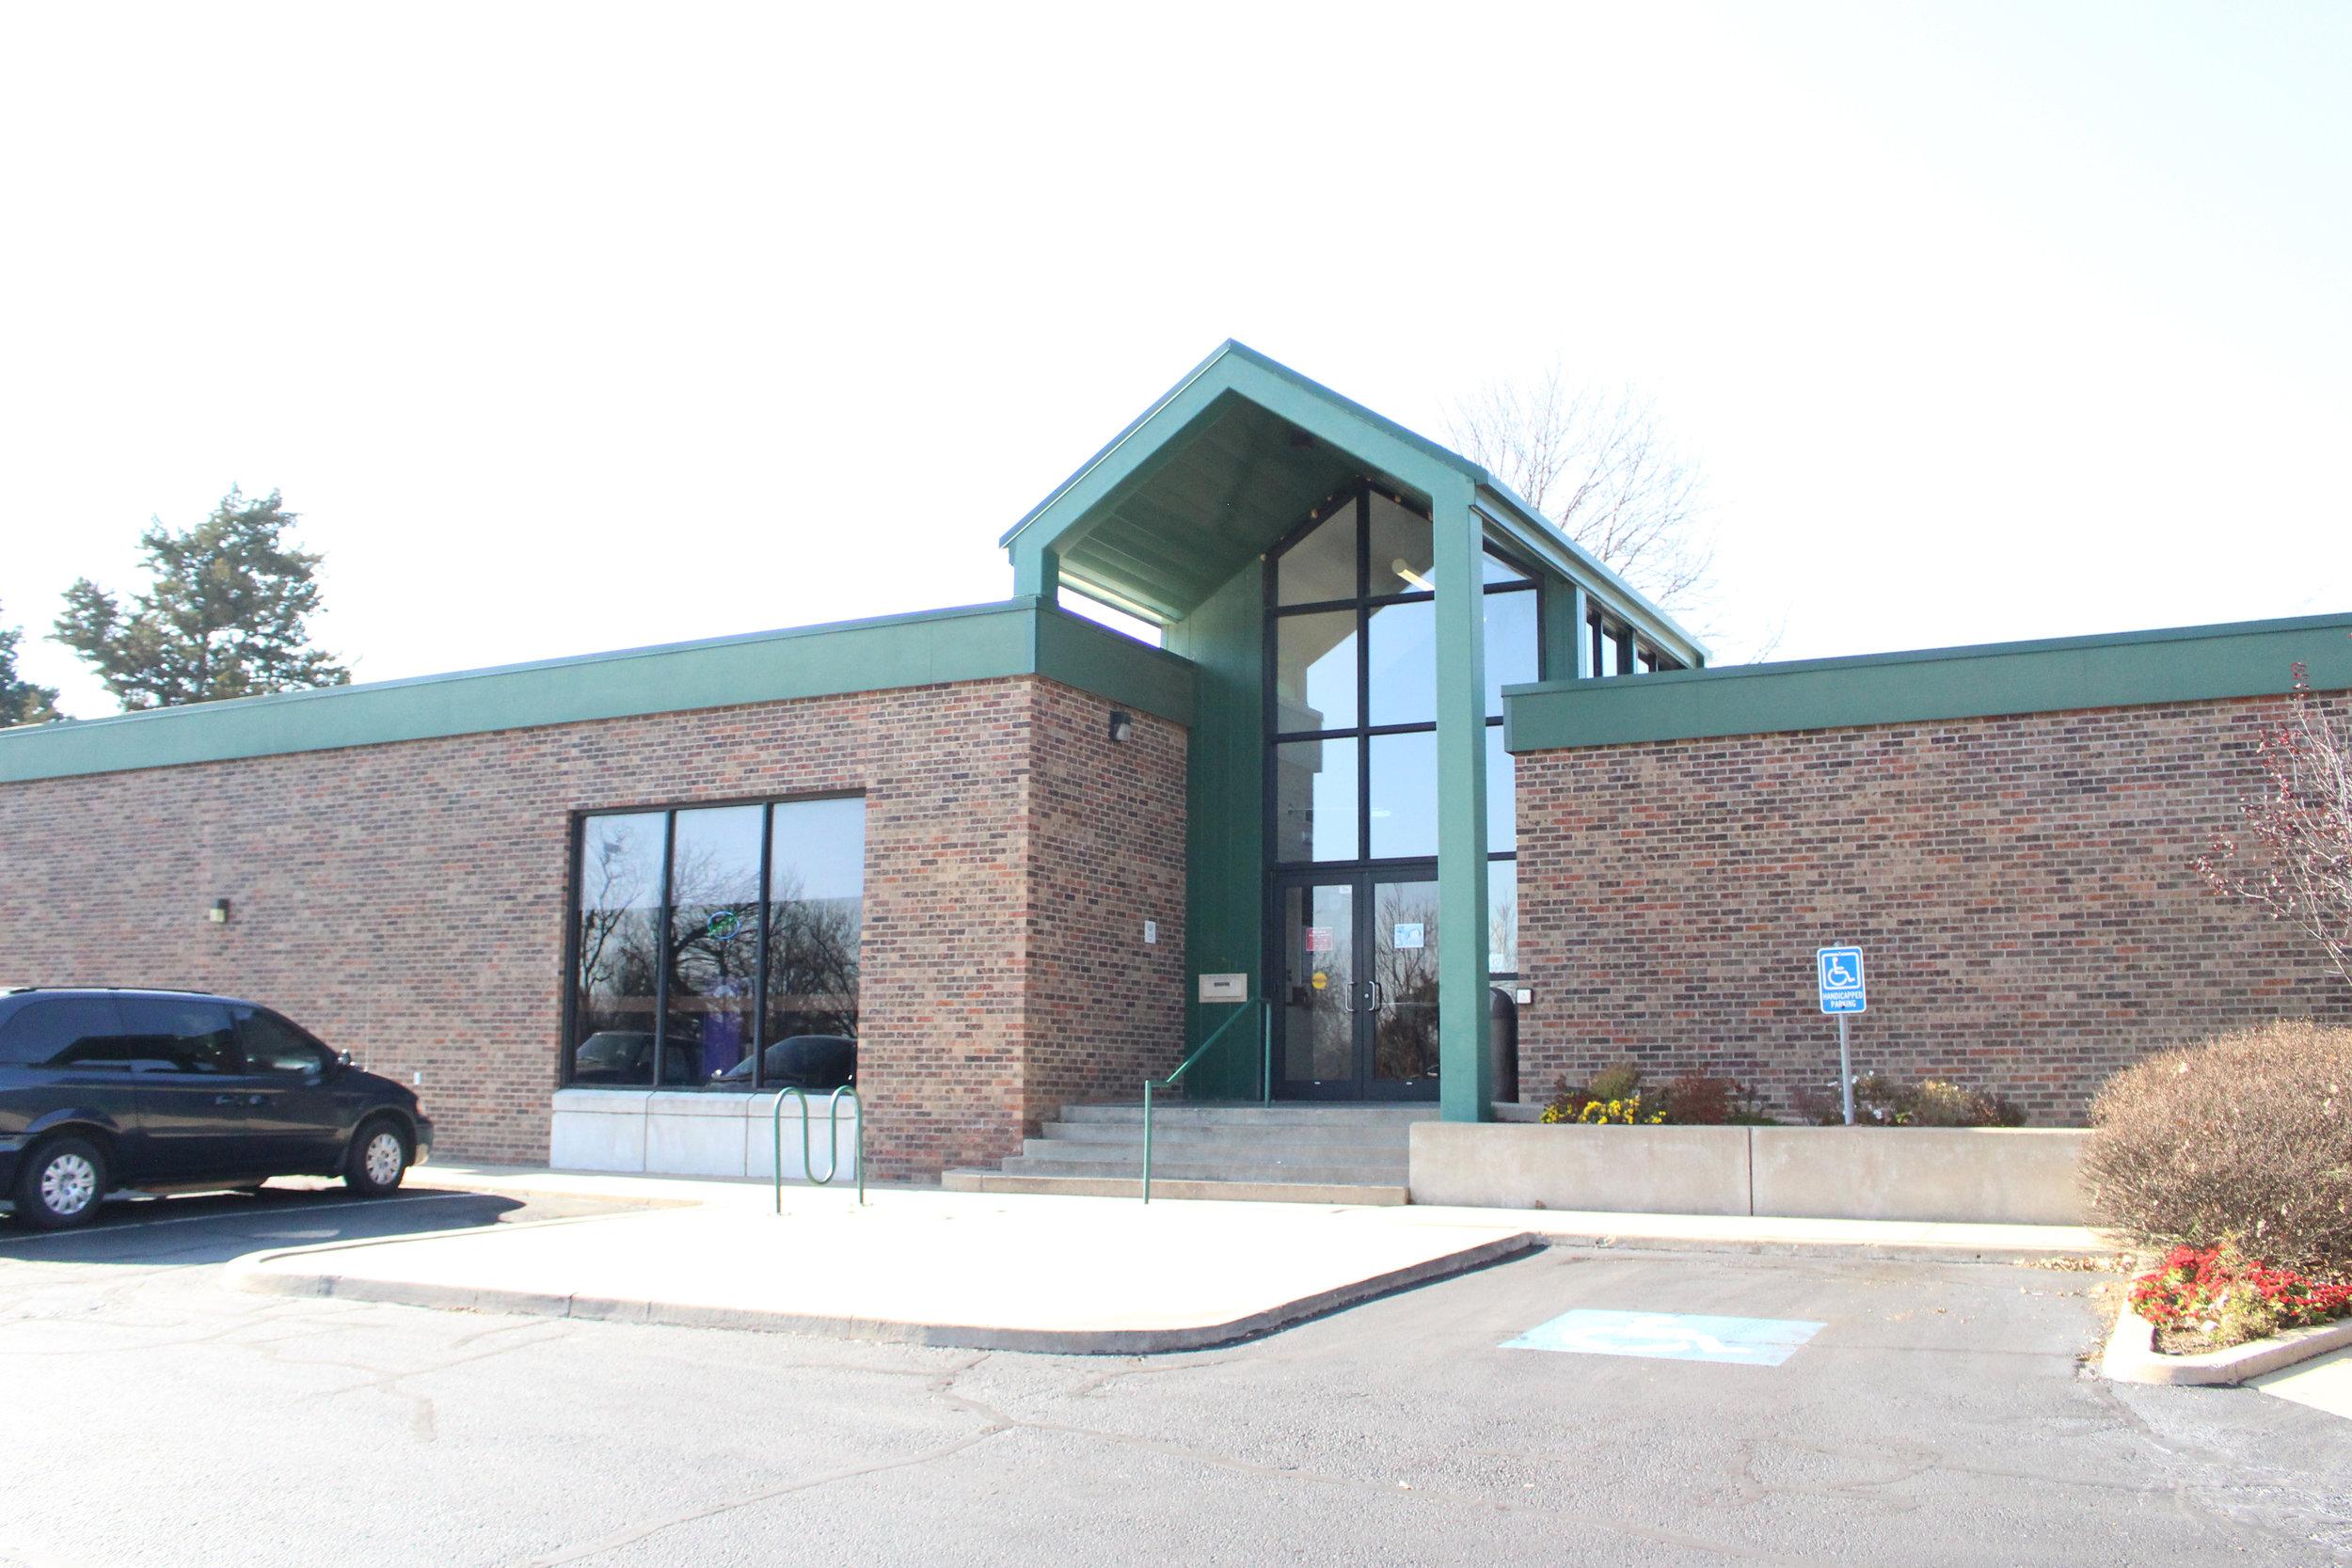 pratt library - prattville 3219 south 113th west avenue